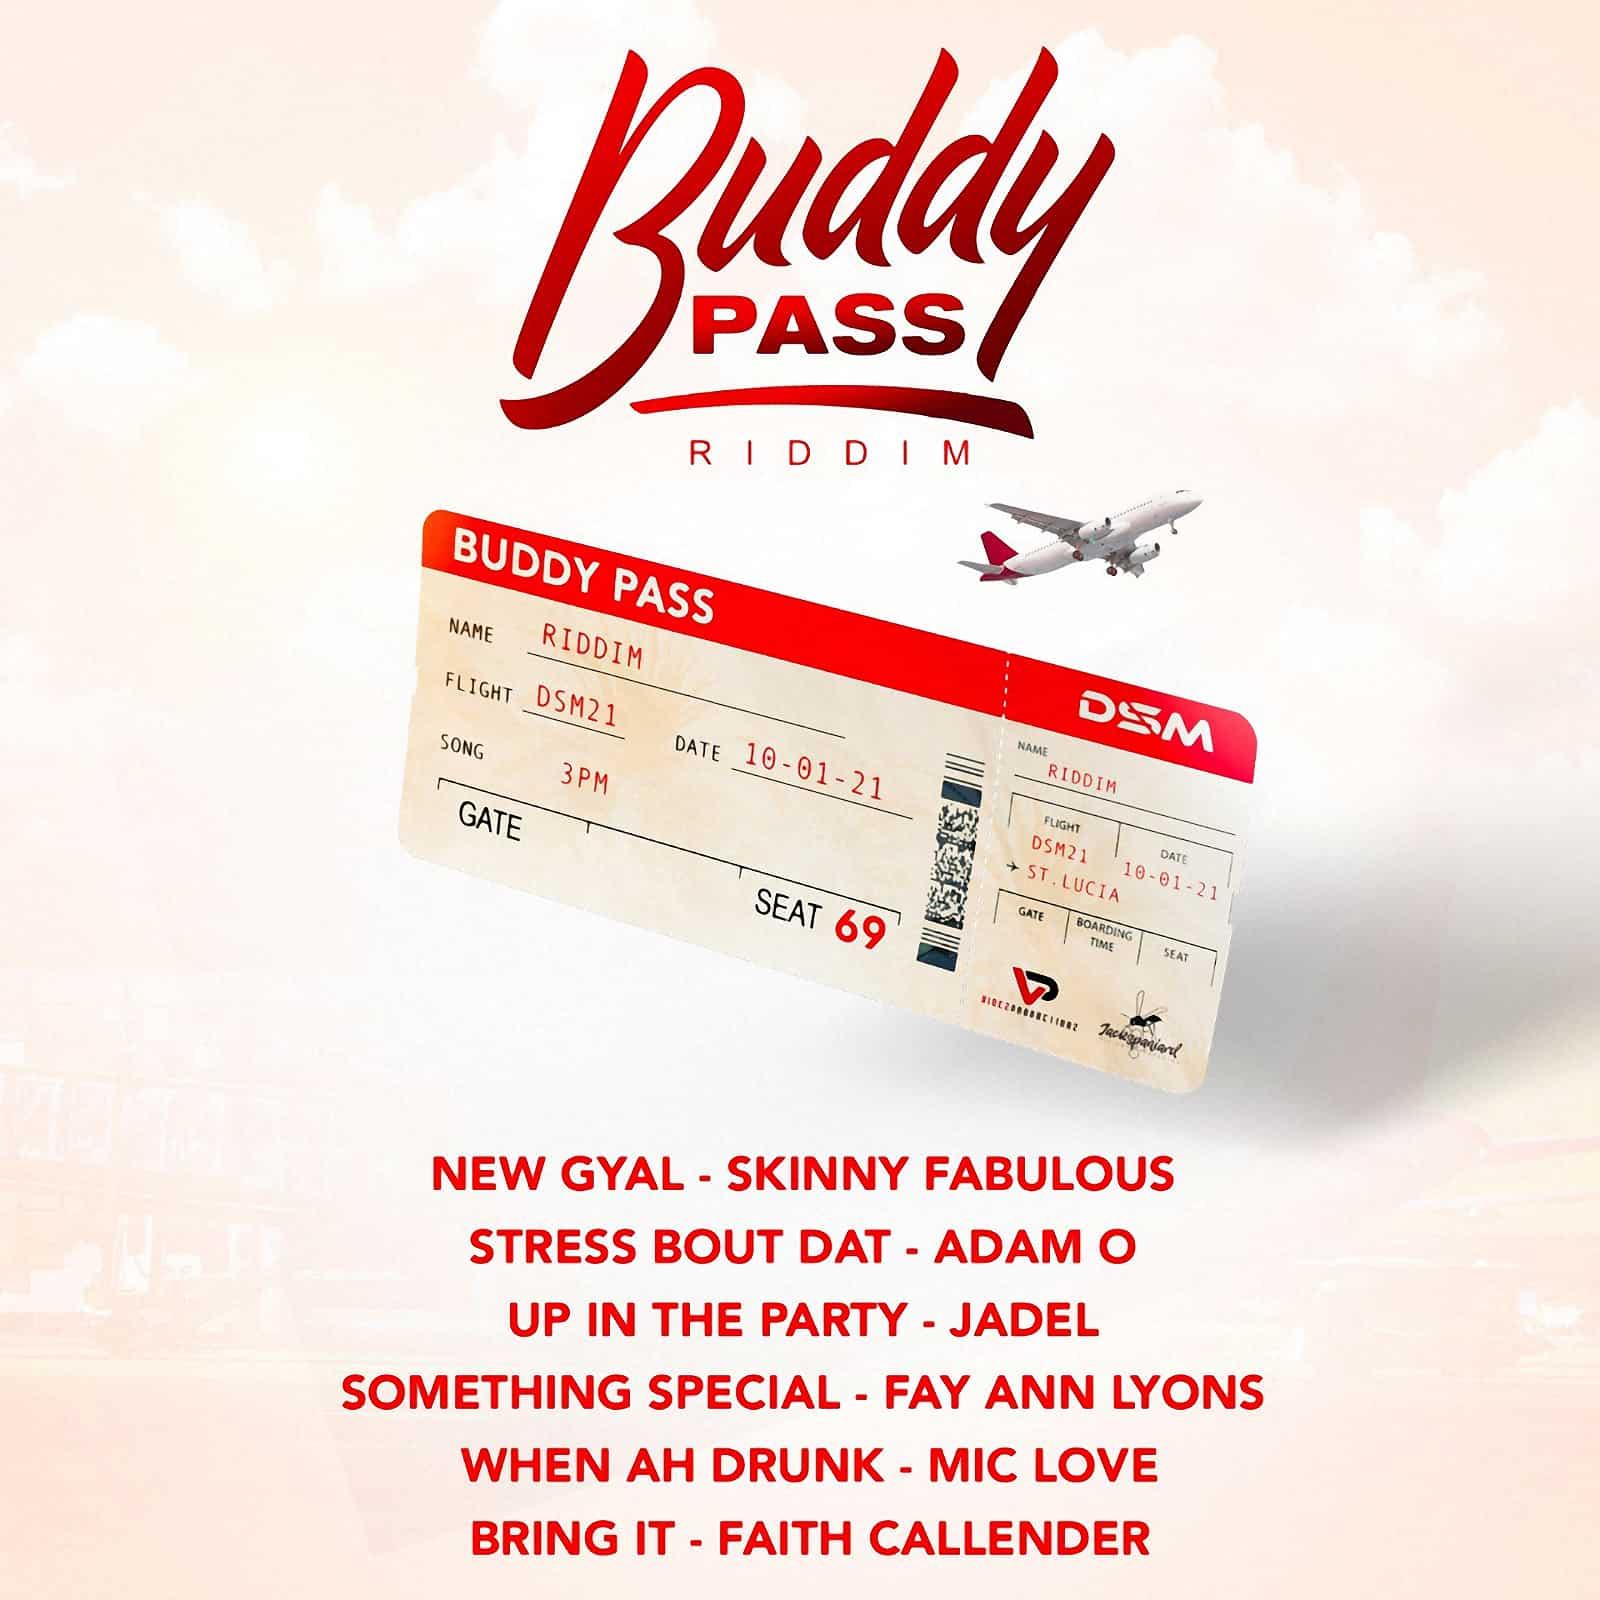 Buddy Pass Riddim